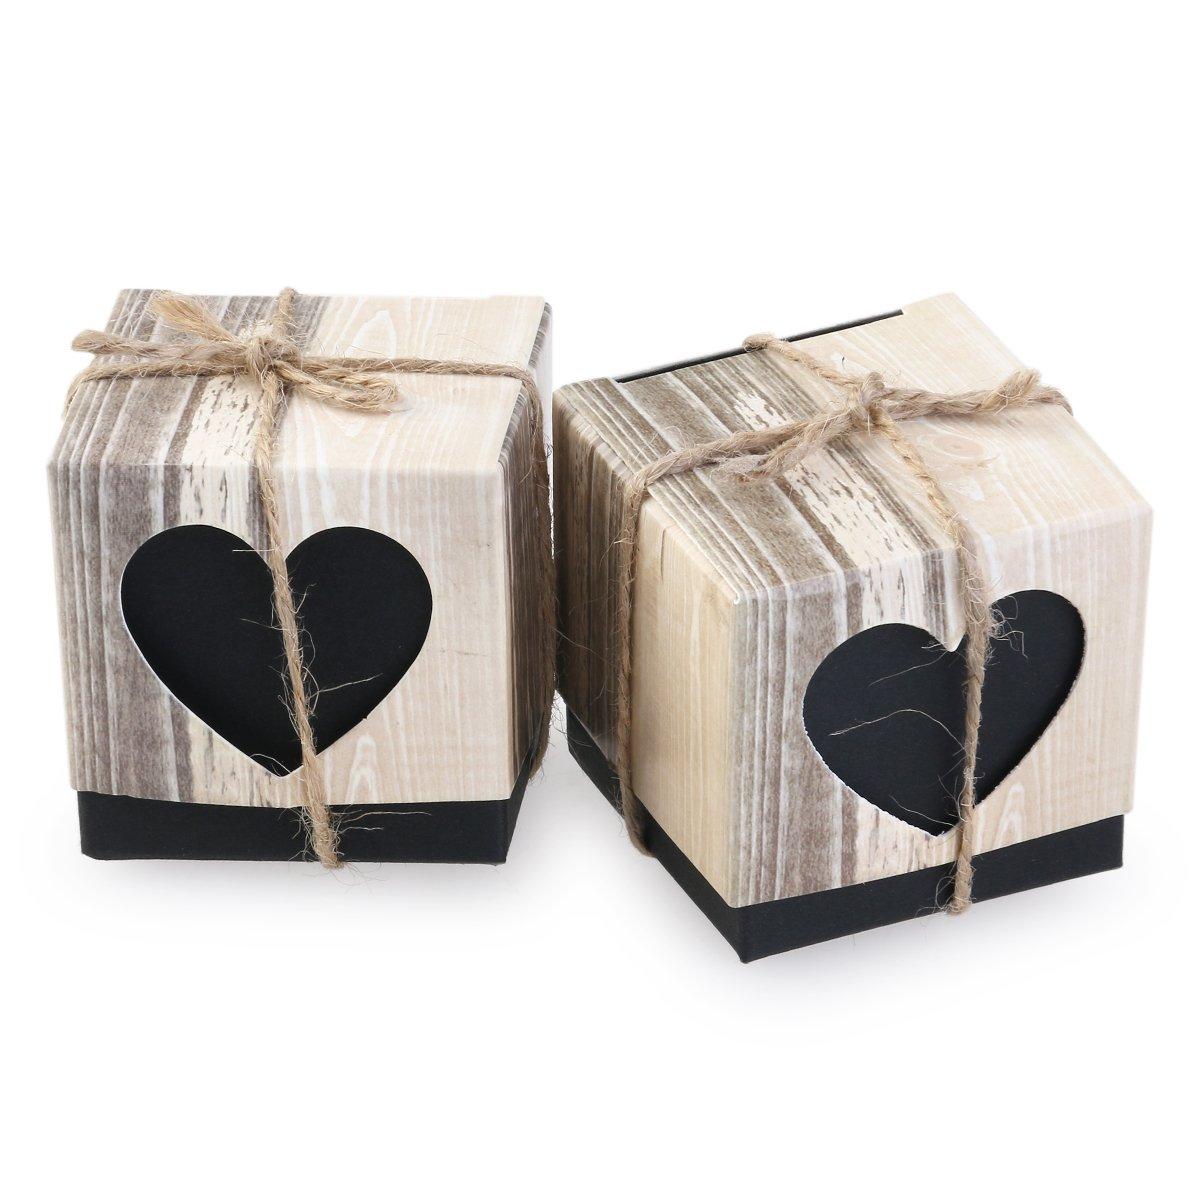 100pcs Blank Heart Rustic Kraft Candy Boxes Wedding Shabby Chic Burlap Jute Vintage Gift Favor (Spades Heart)